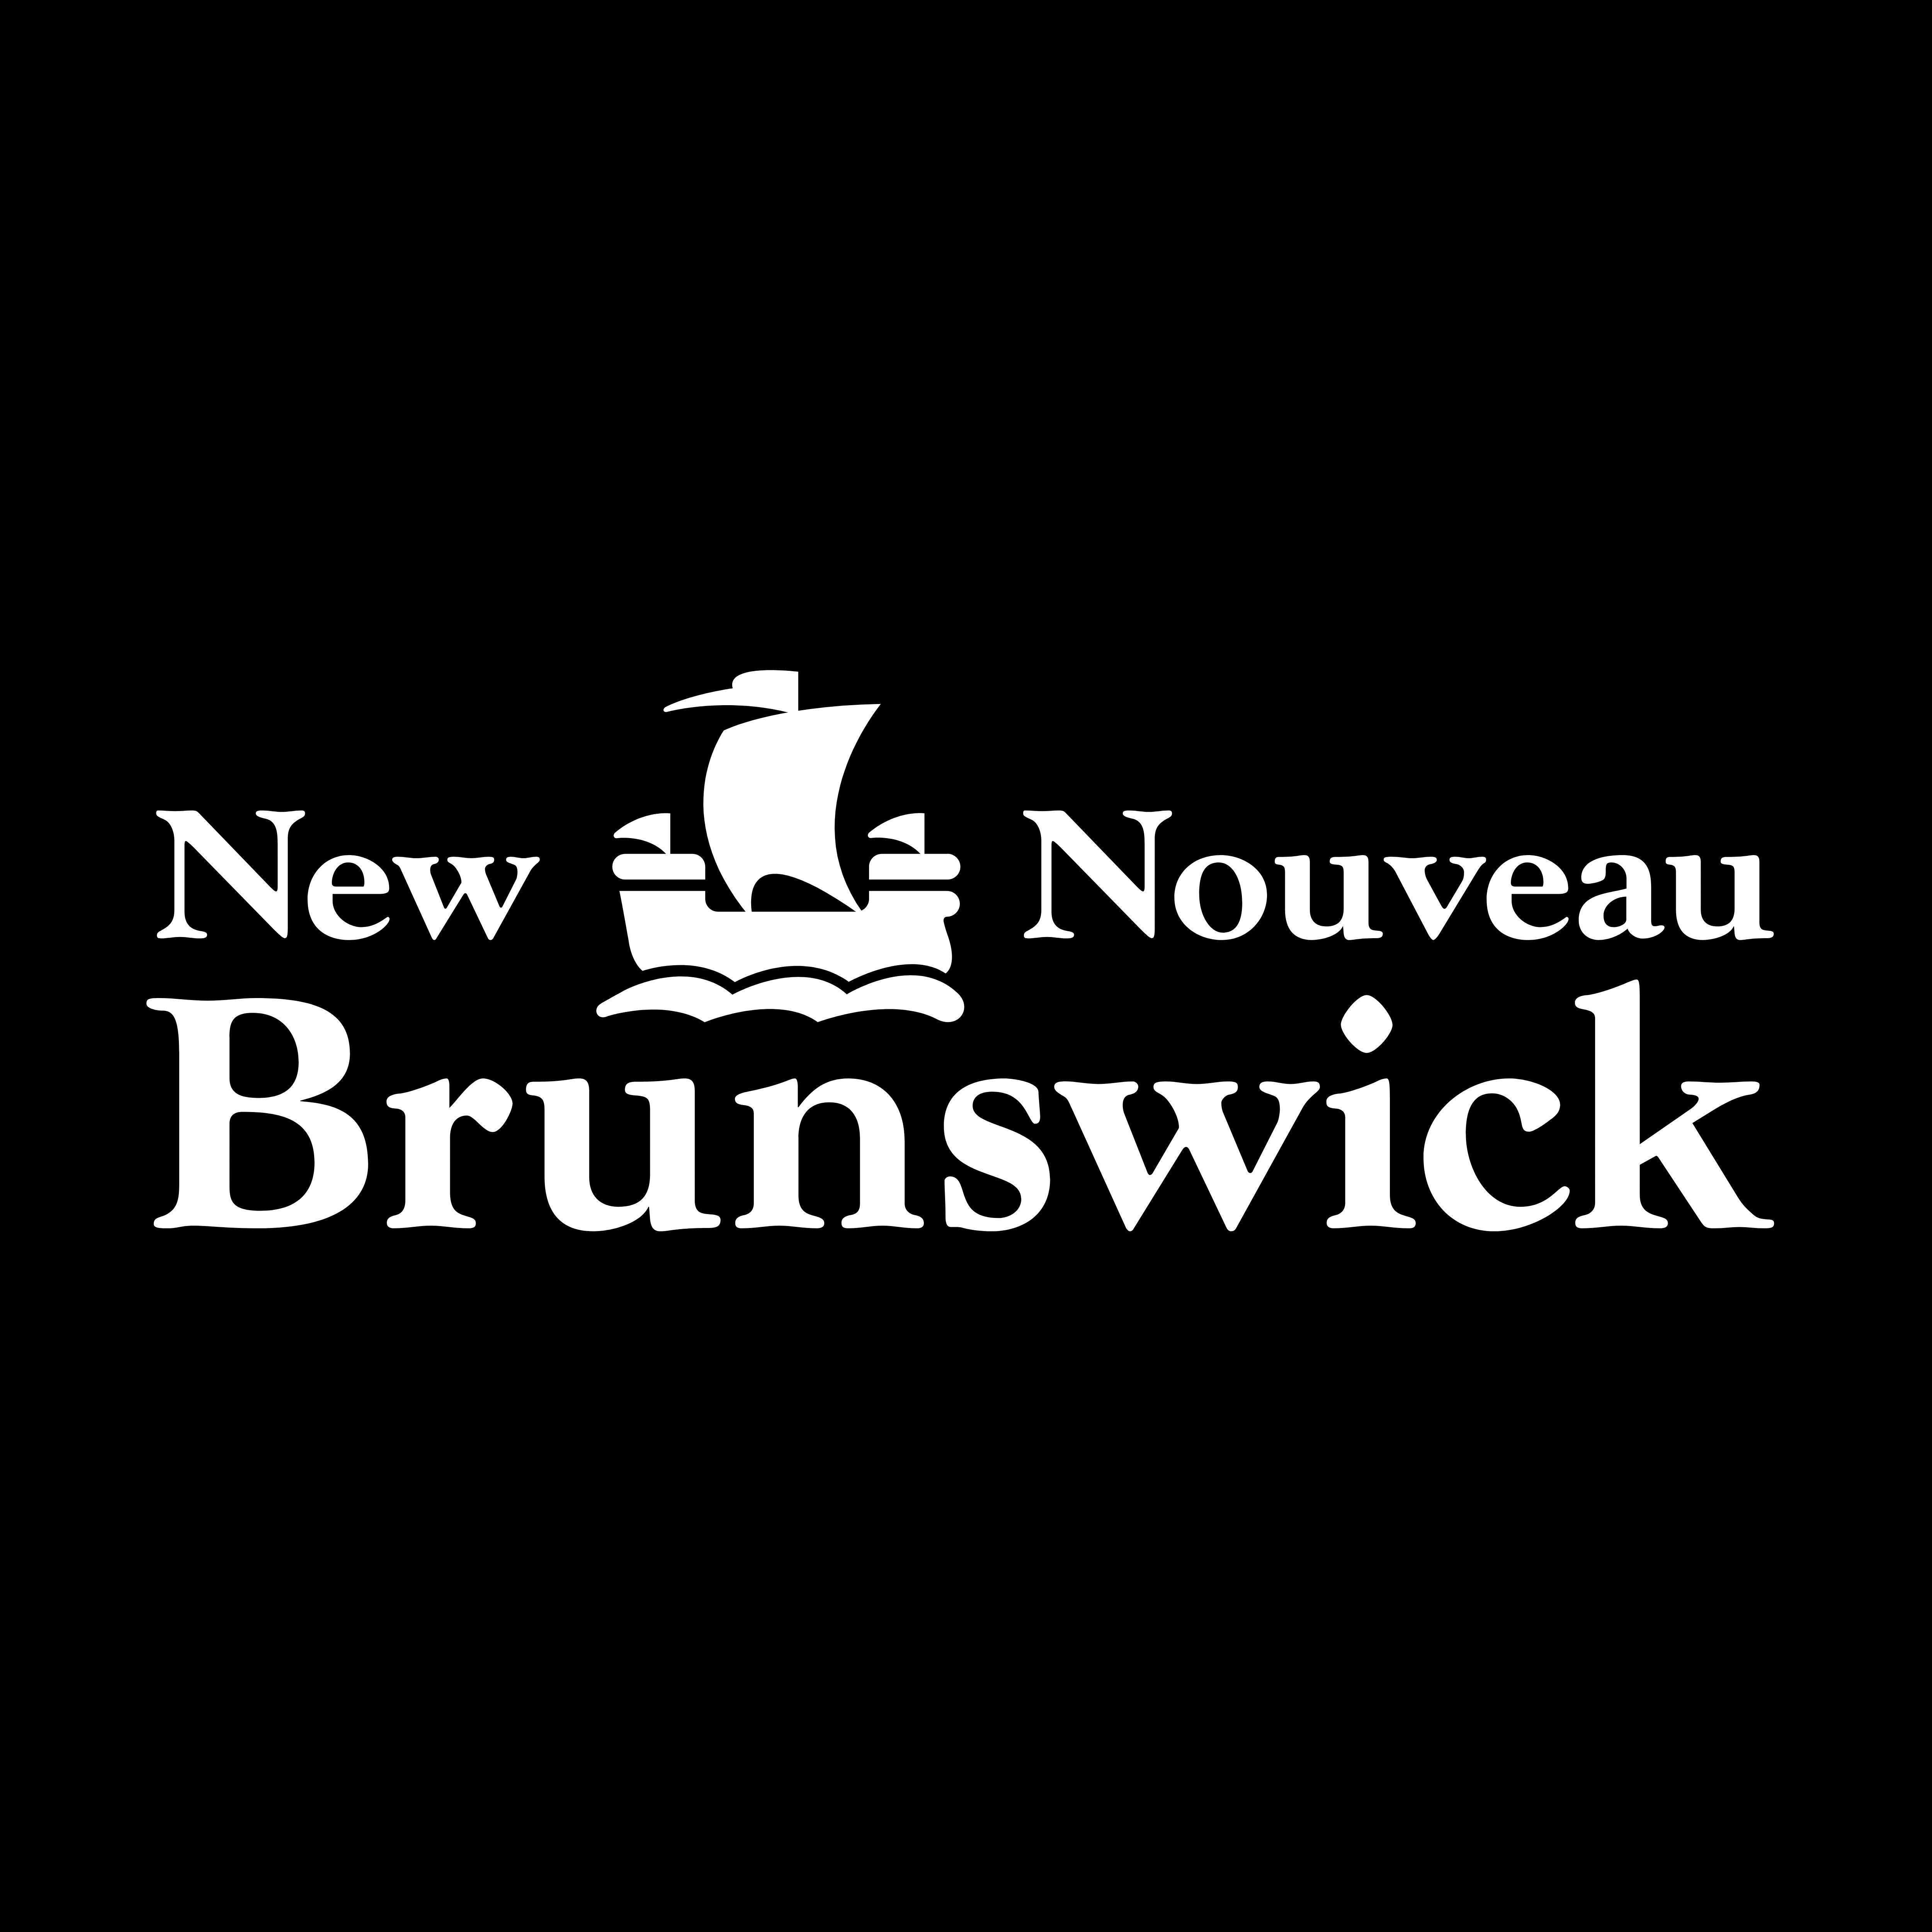 New brunswick logos download new brunswick publicscrutiny Images